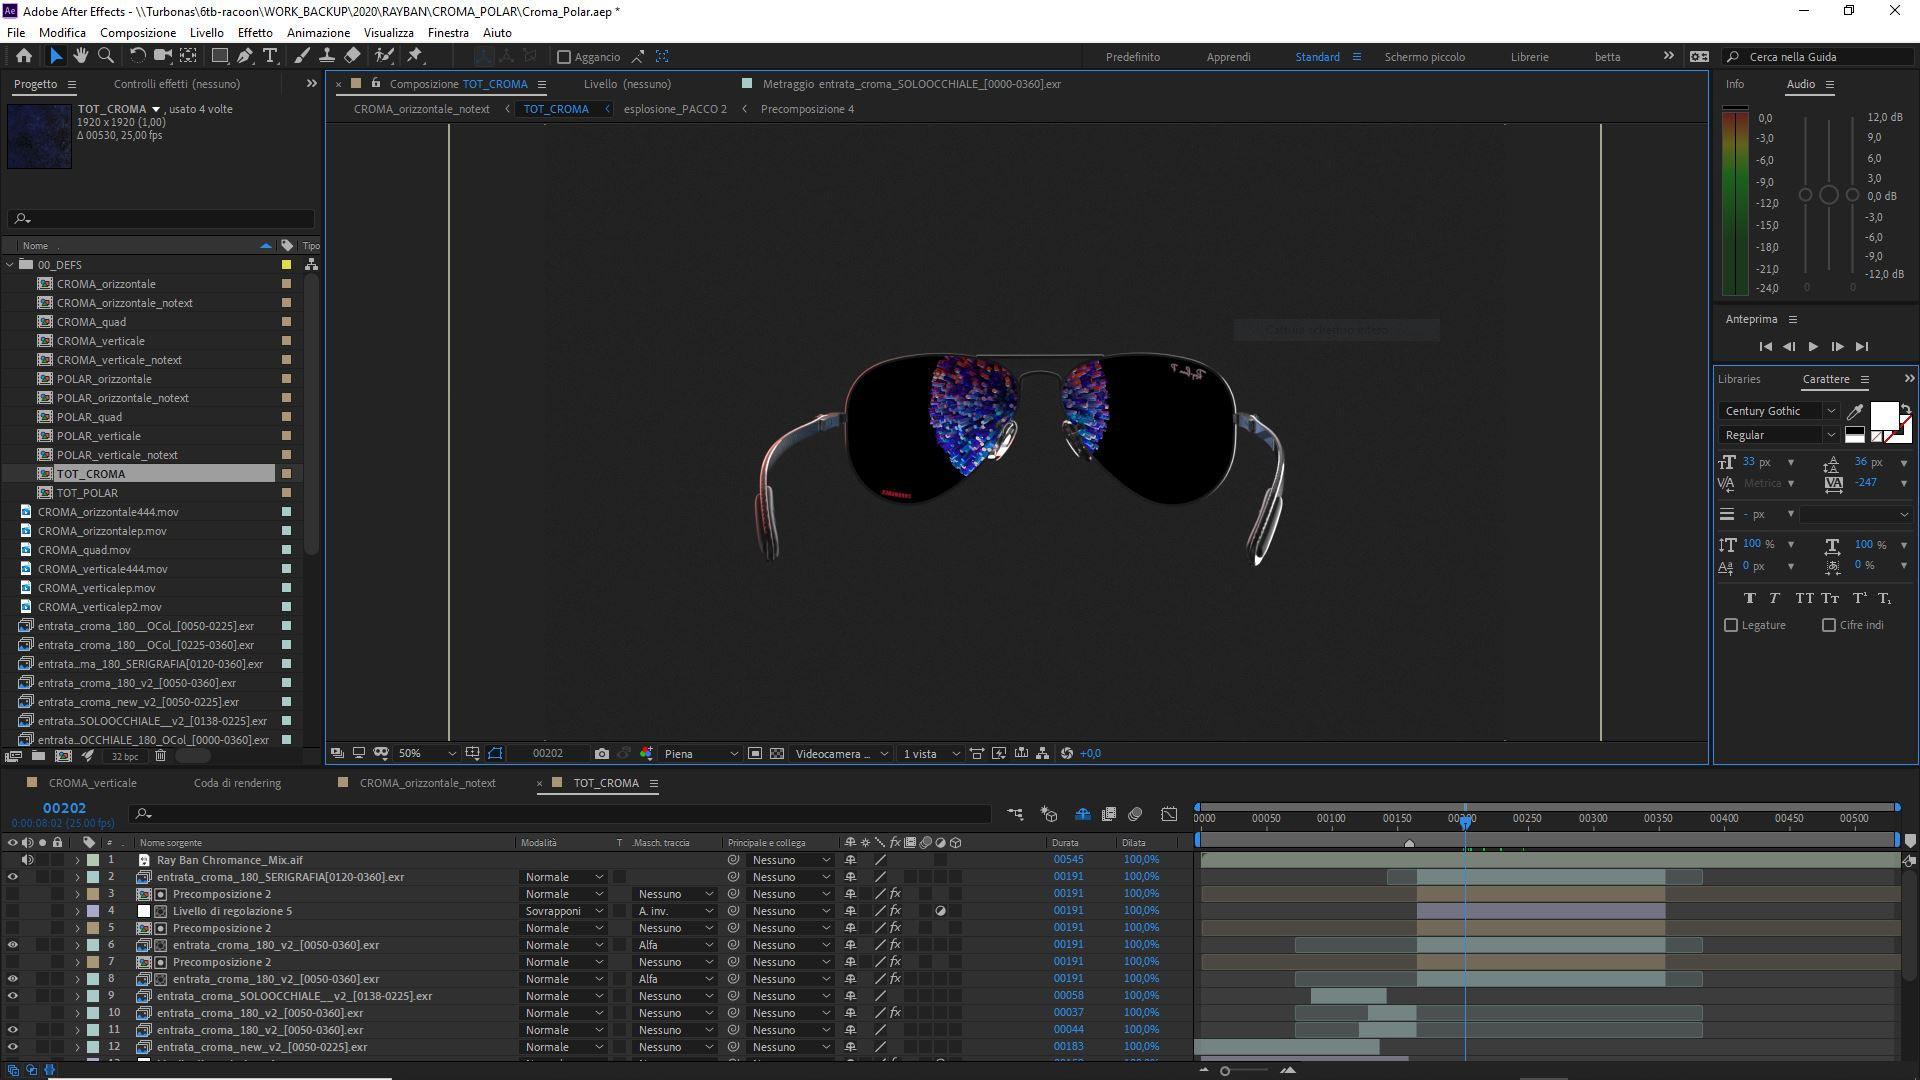 Rayban_motion_graphics_design__3d_racoonstudio_13